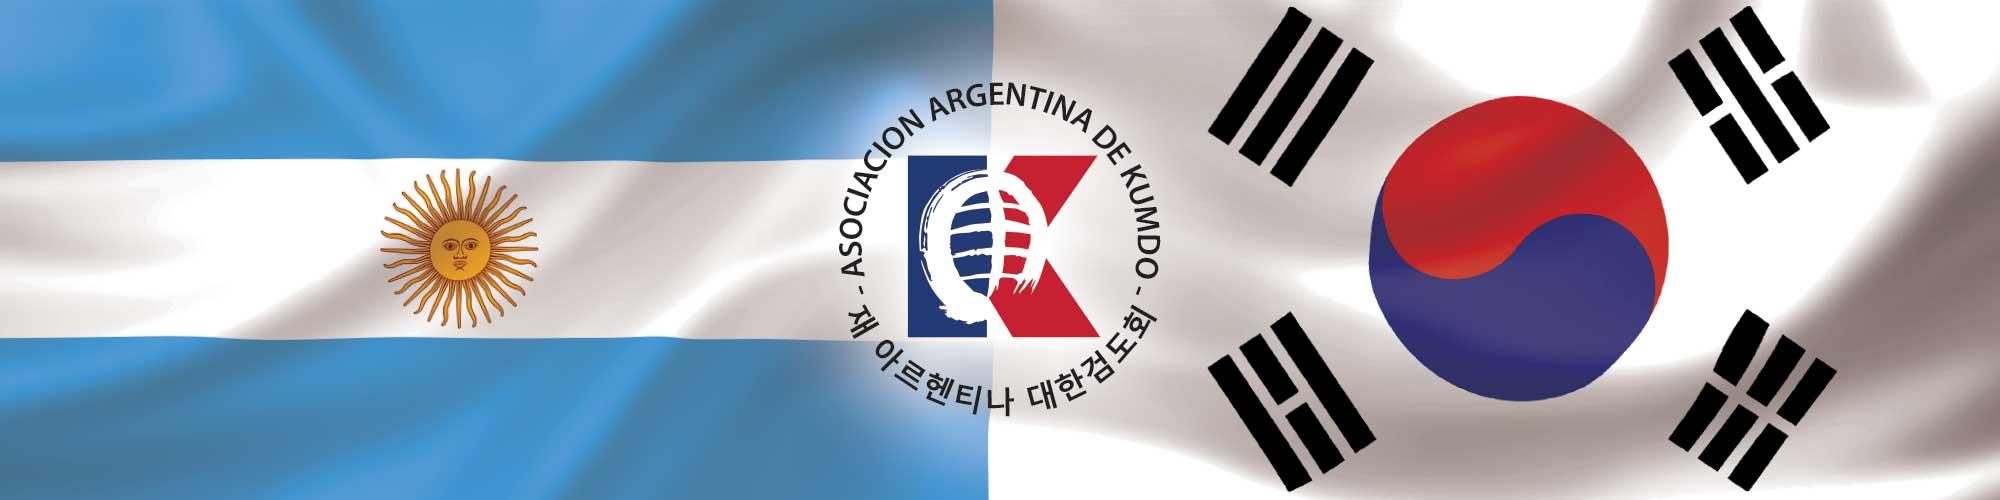 bandera_argentina-coreana